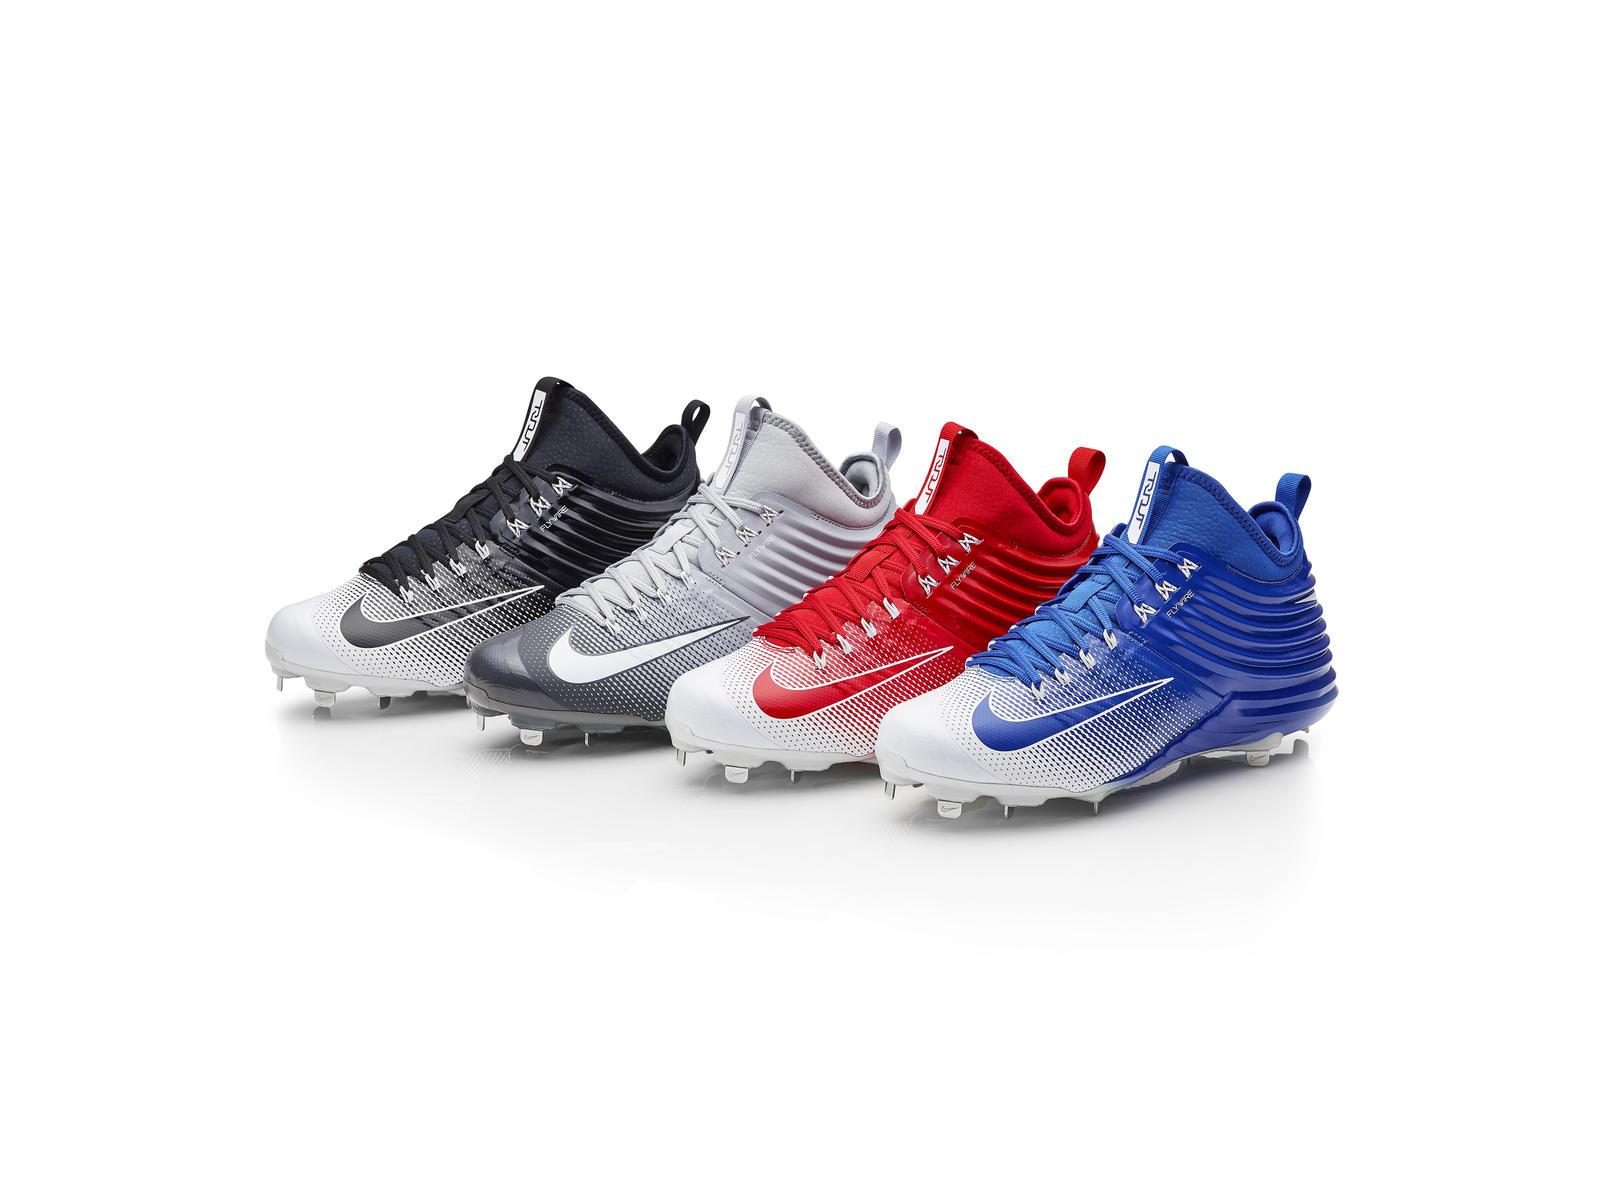 Nike_Lunar_Vapor_Trout2_HERO